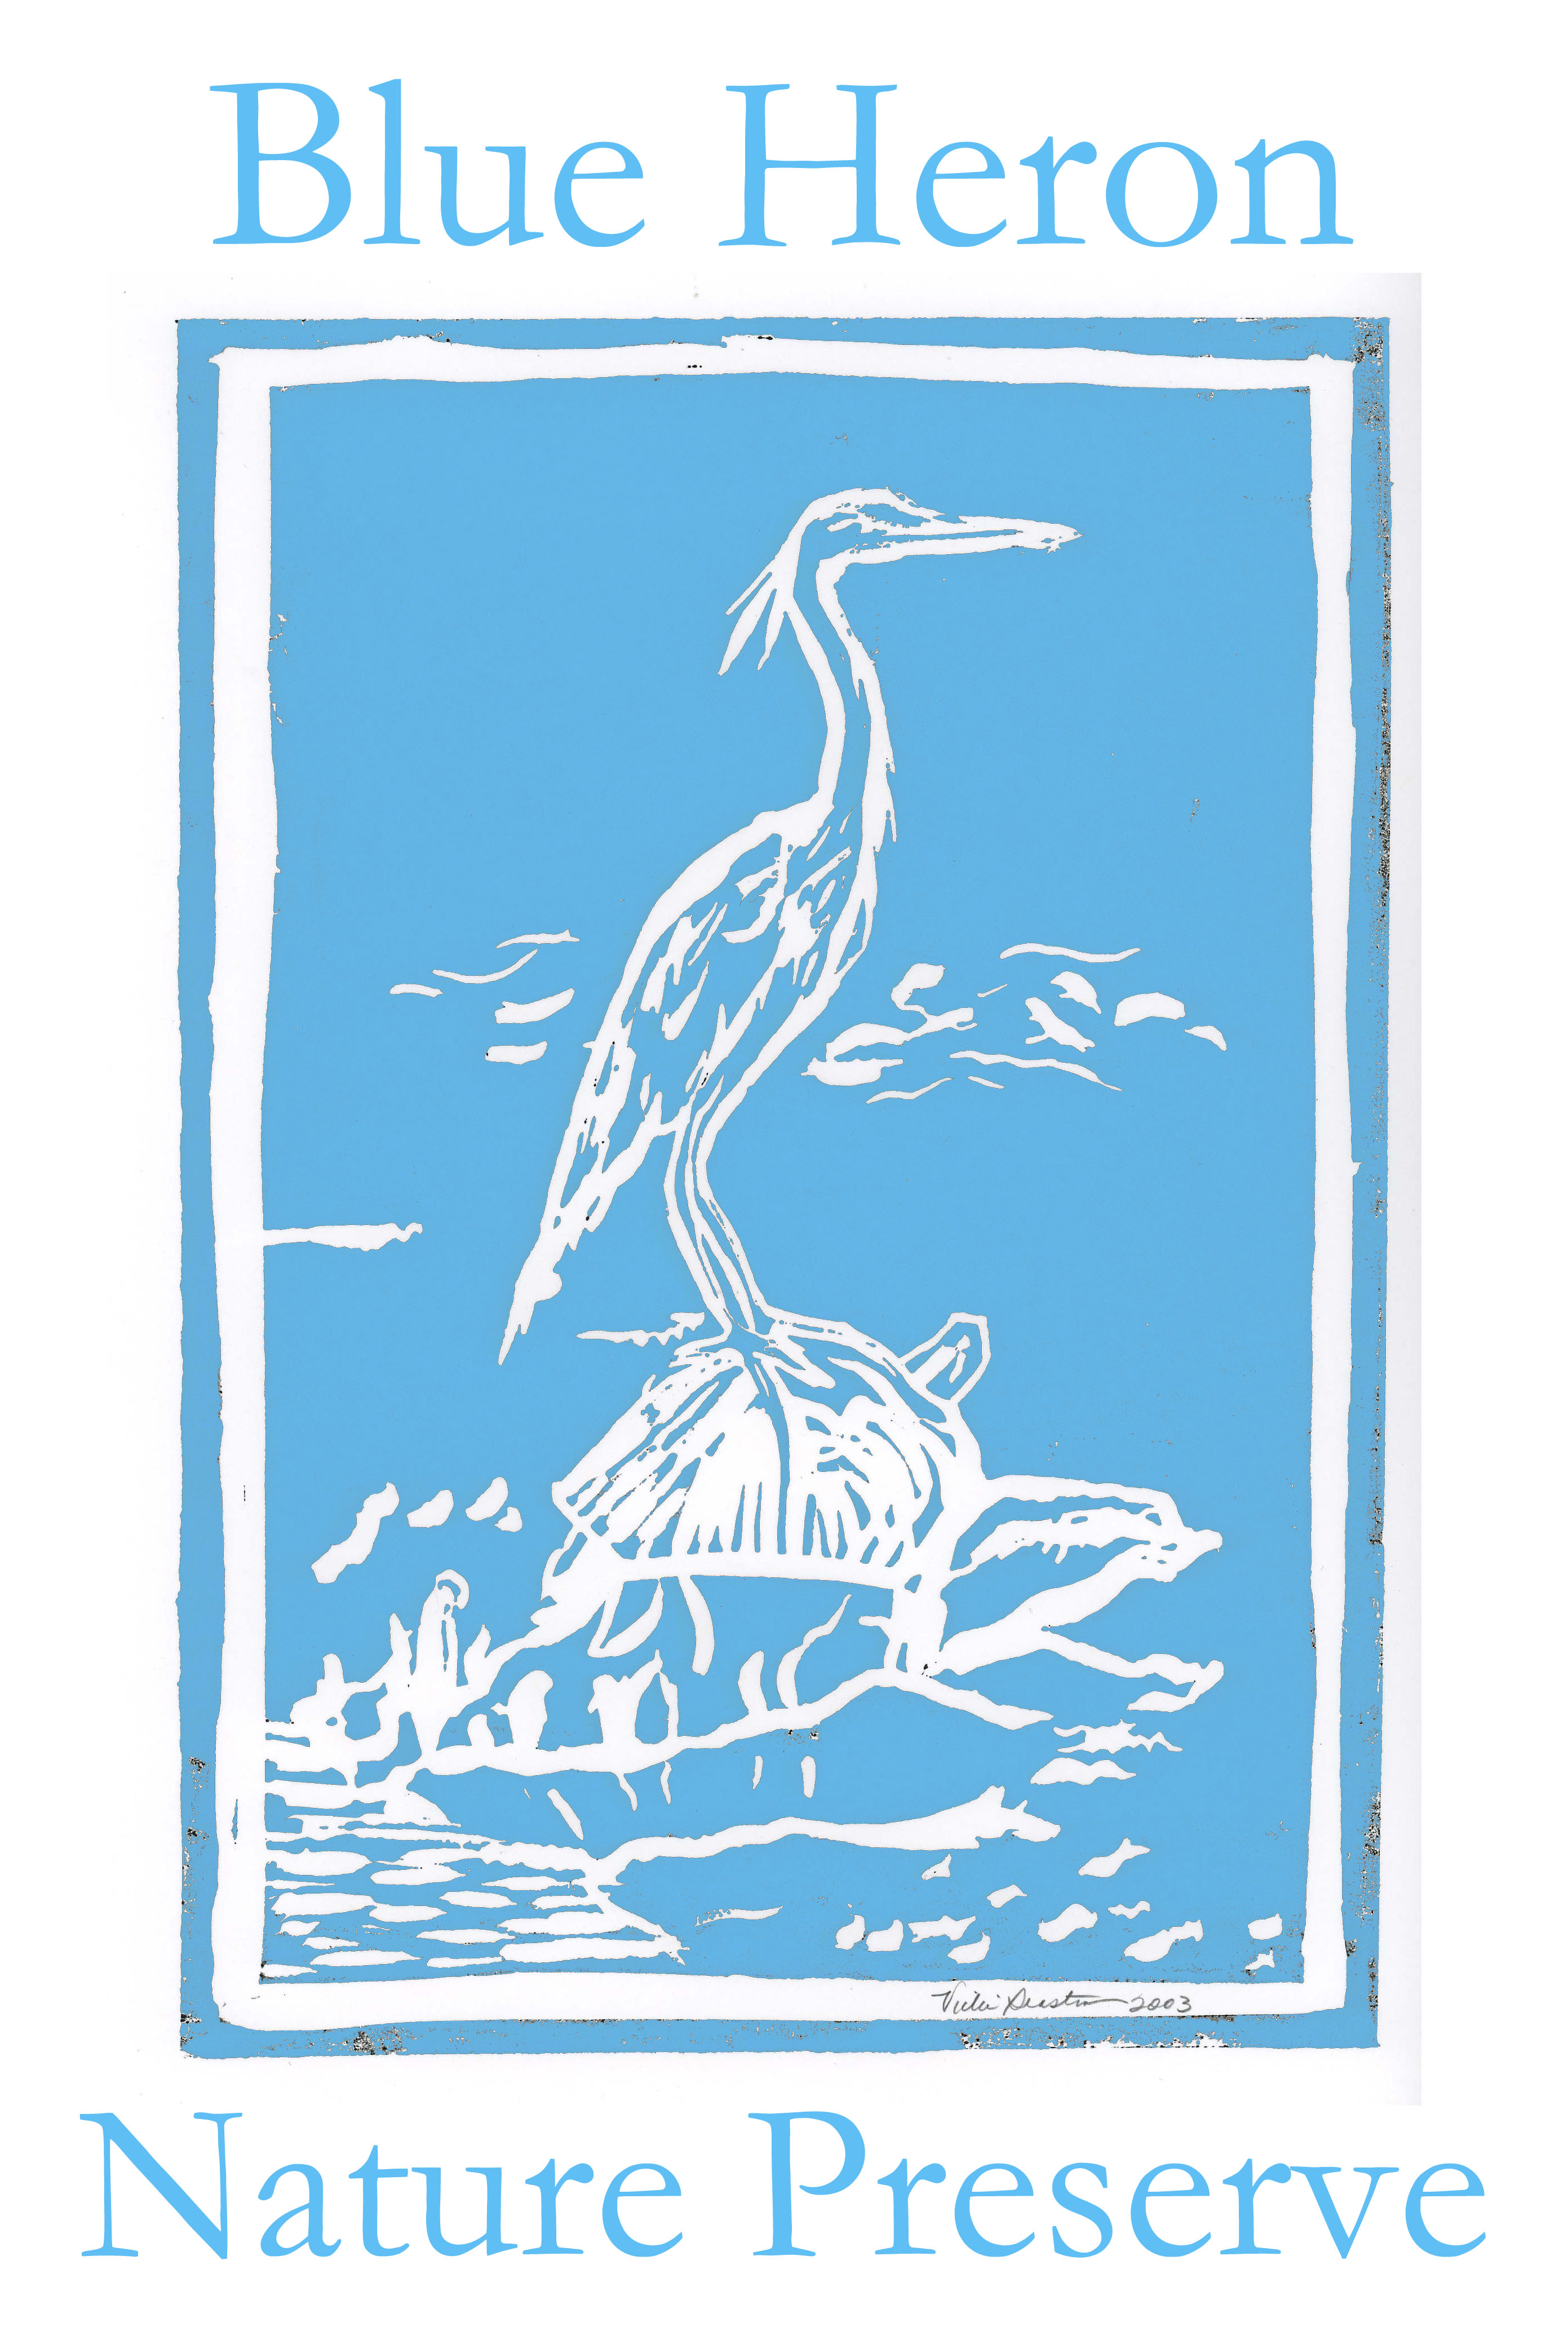 Blue Heron Nature Preserve